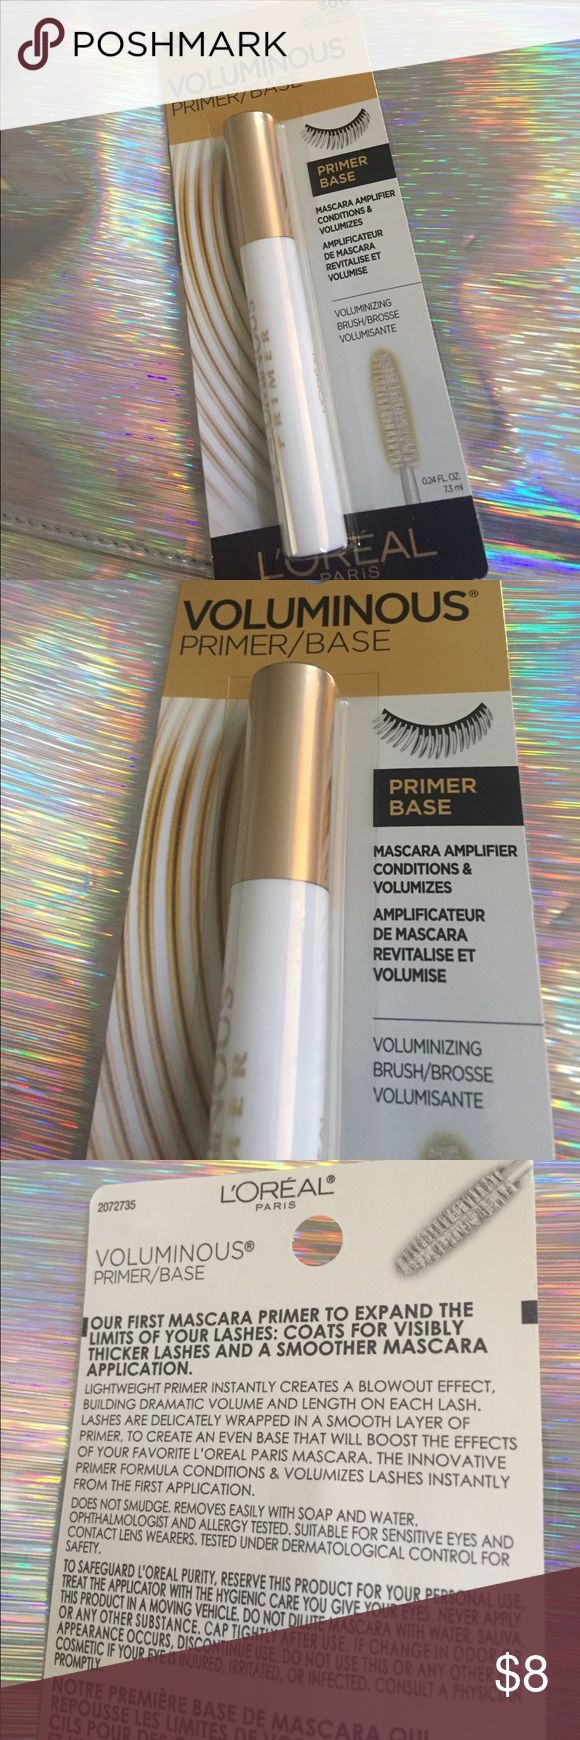 Loreal voluminous primer base mascara New in packaging Loreal Makeup Mascara